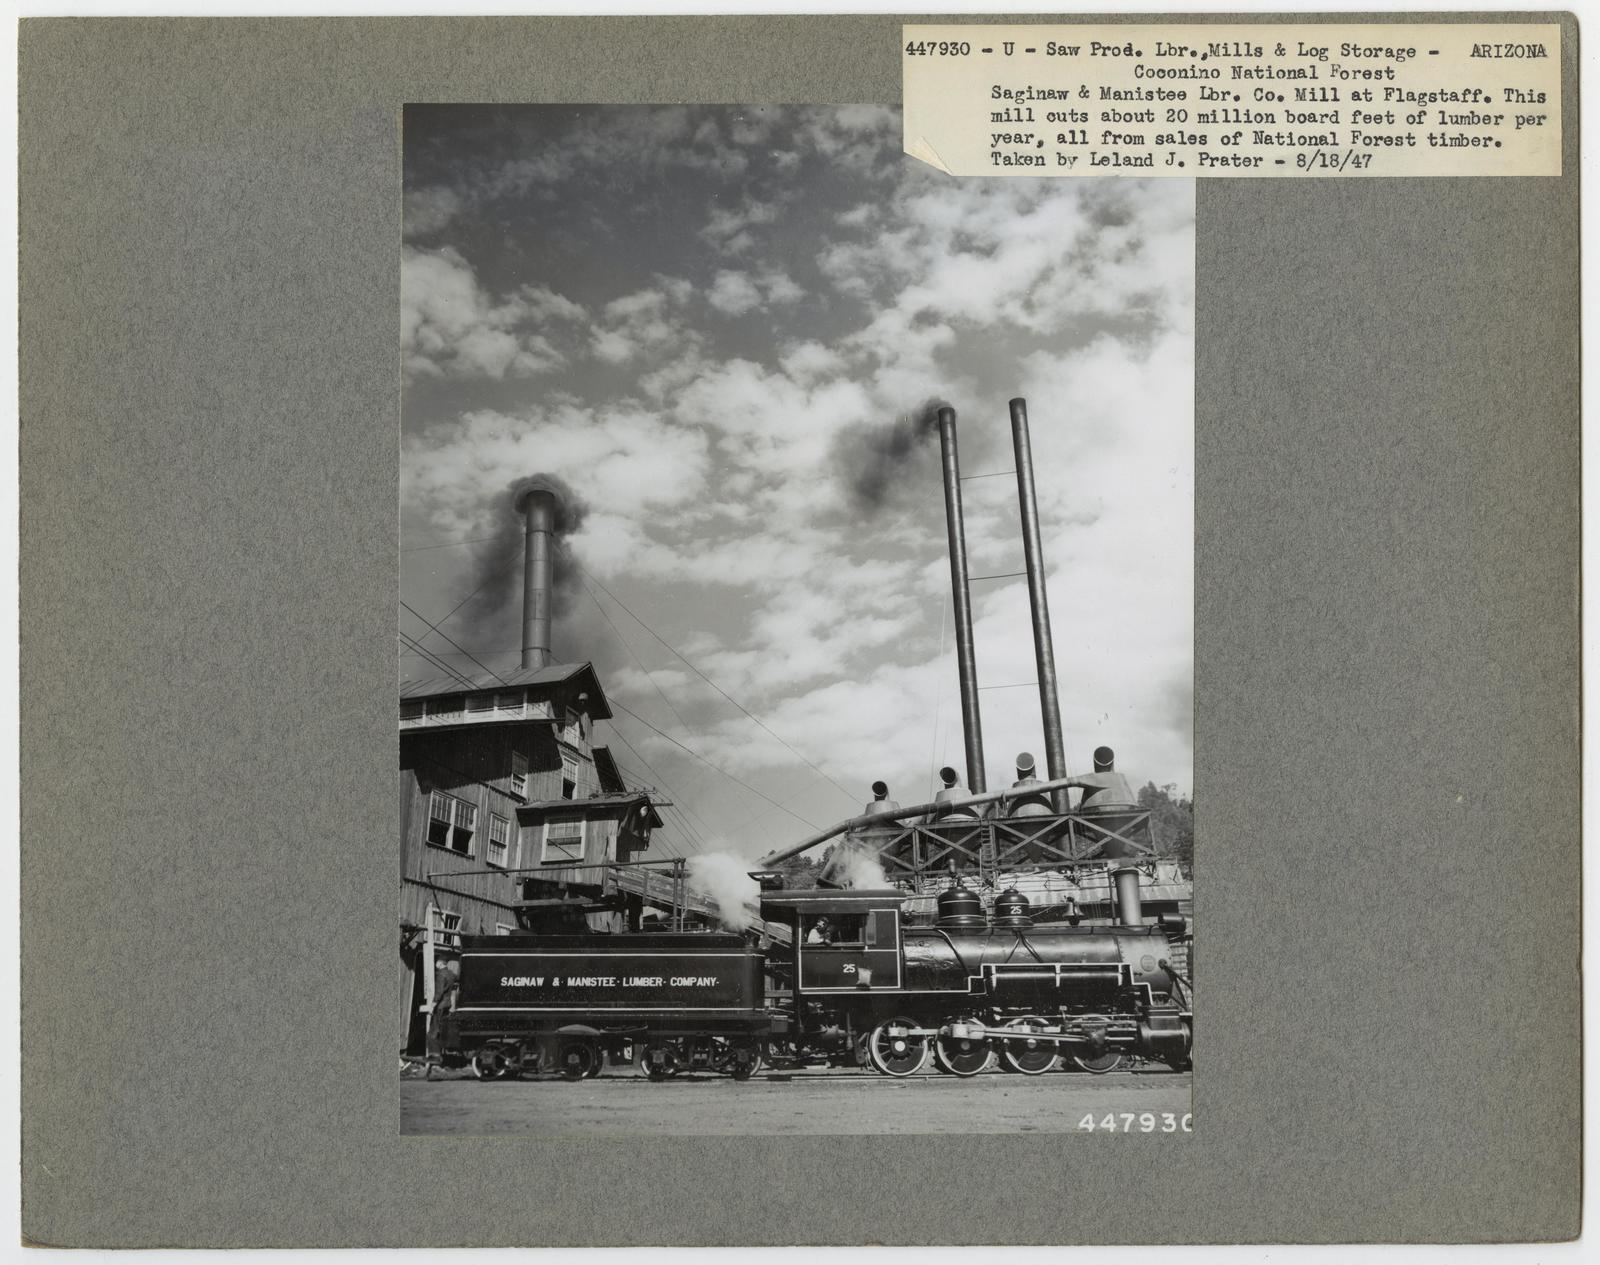 Large Sawmills - Arizona